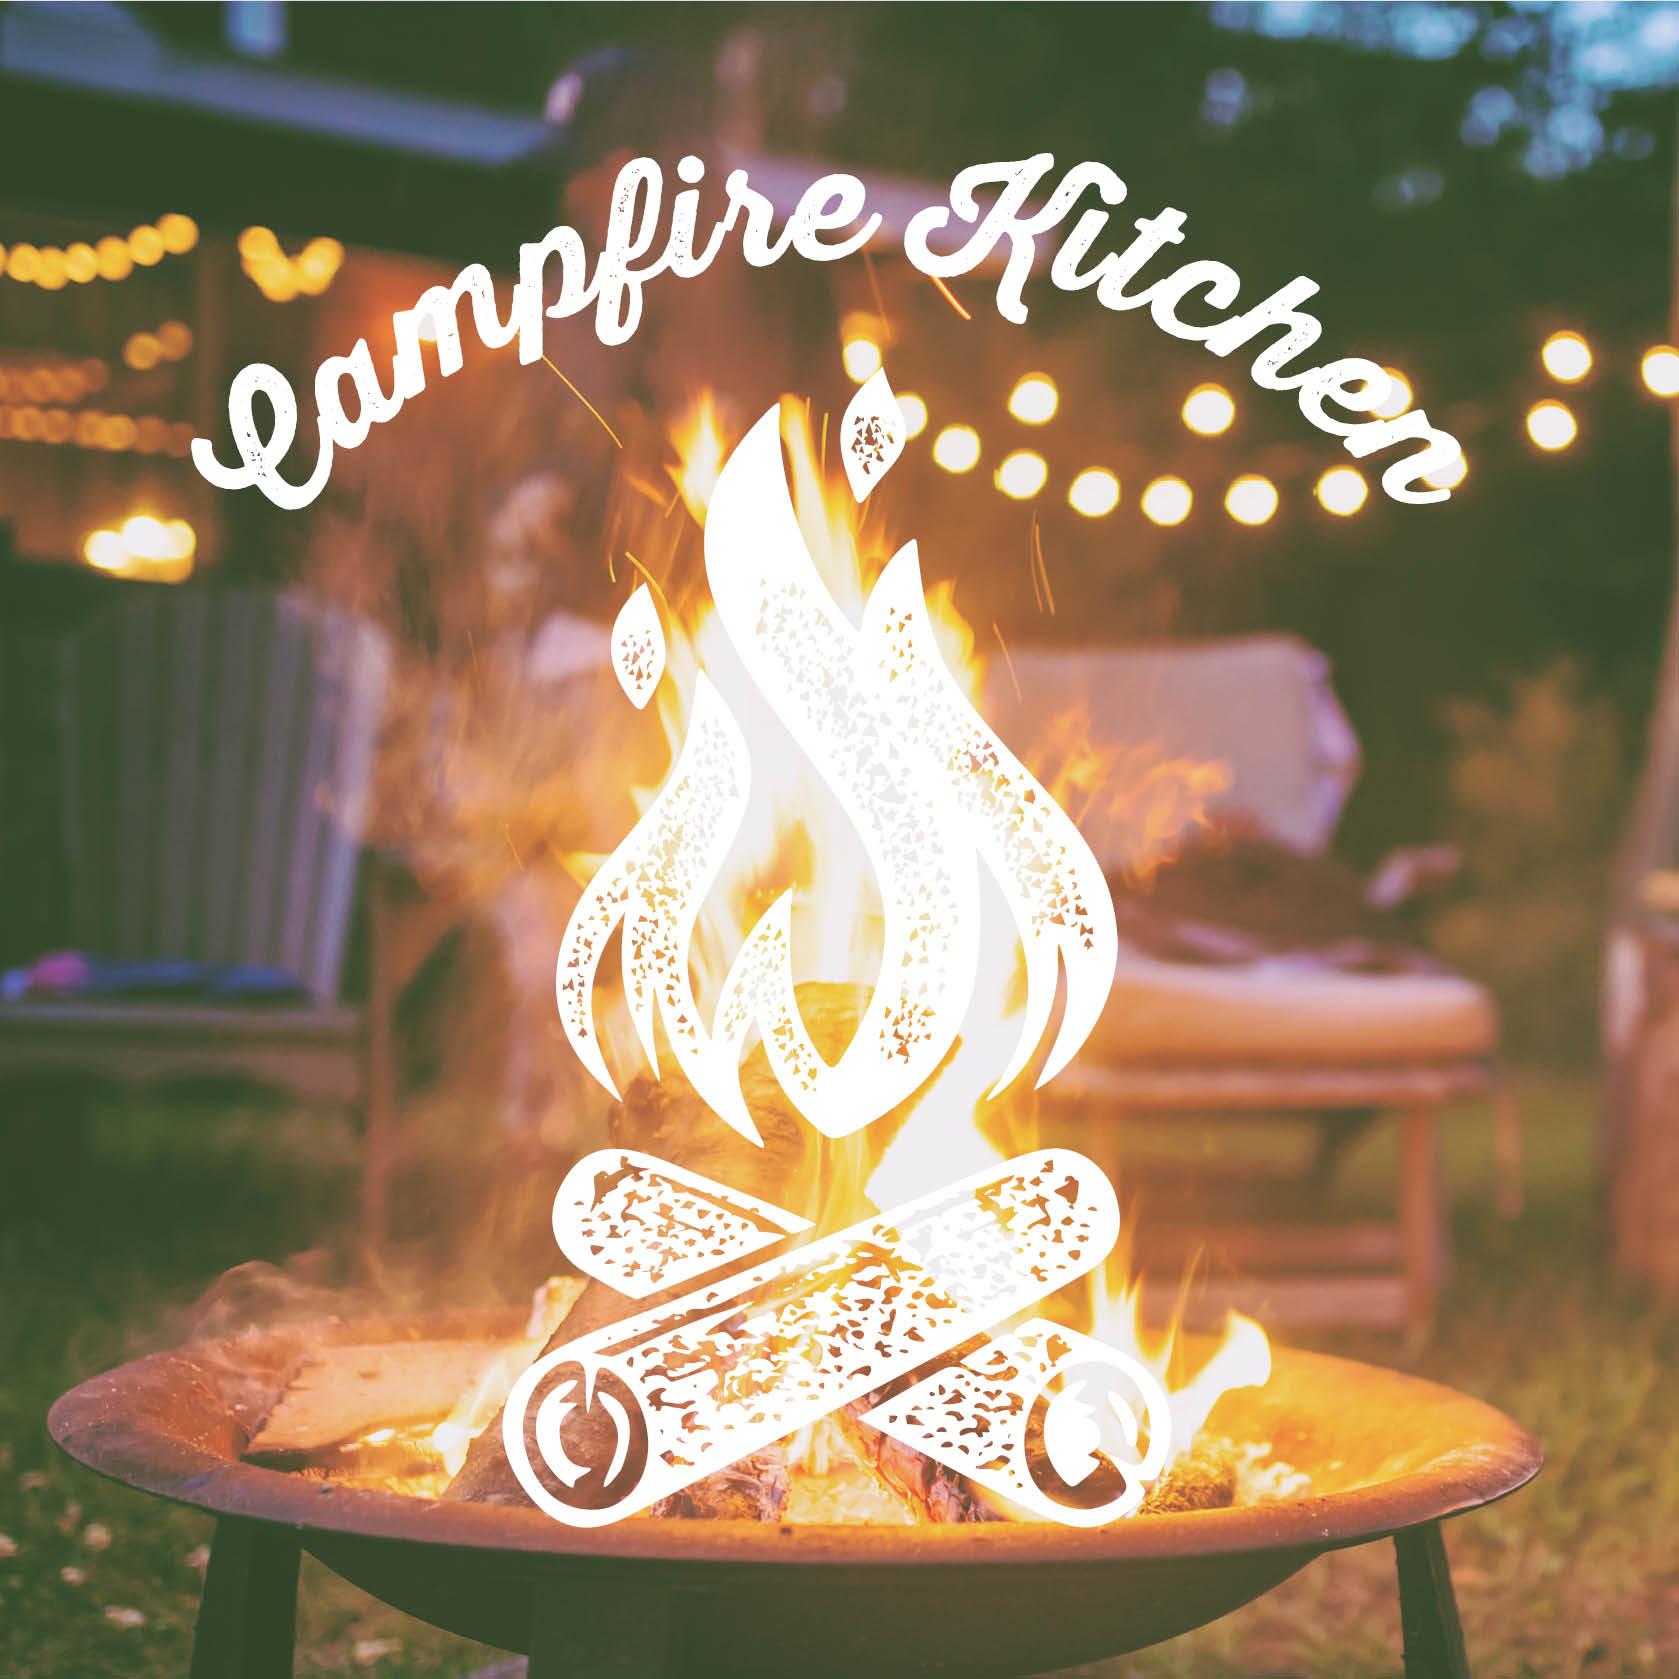 OYB_CampfireKitchen